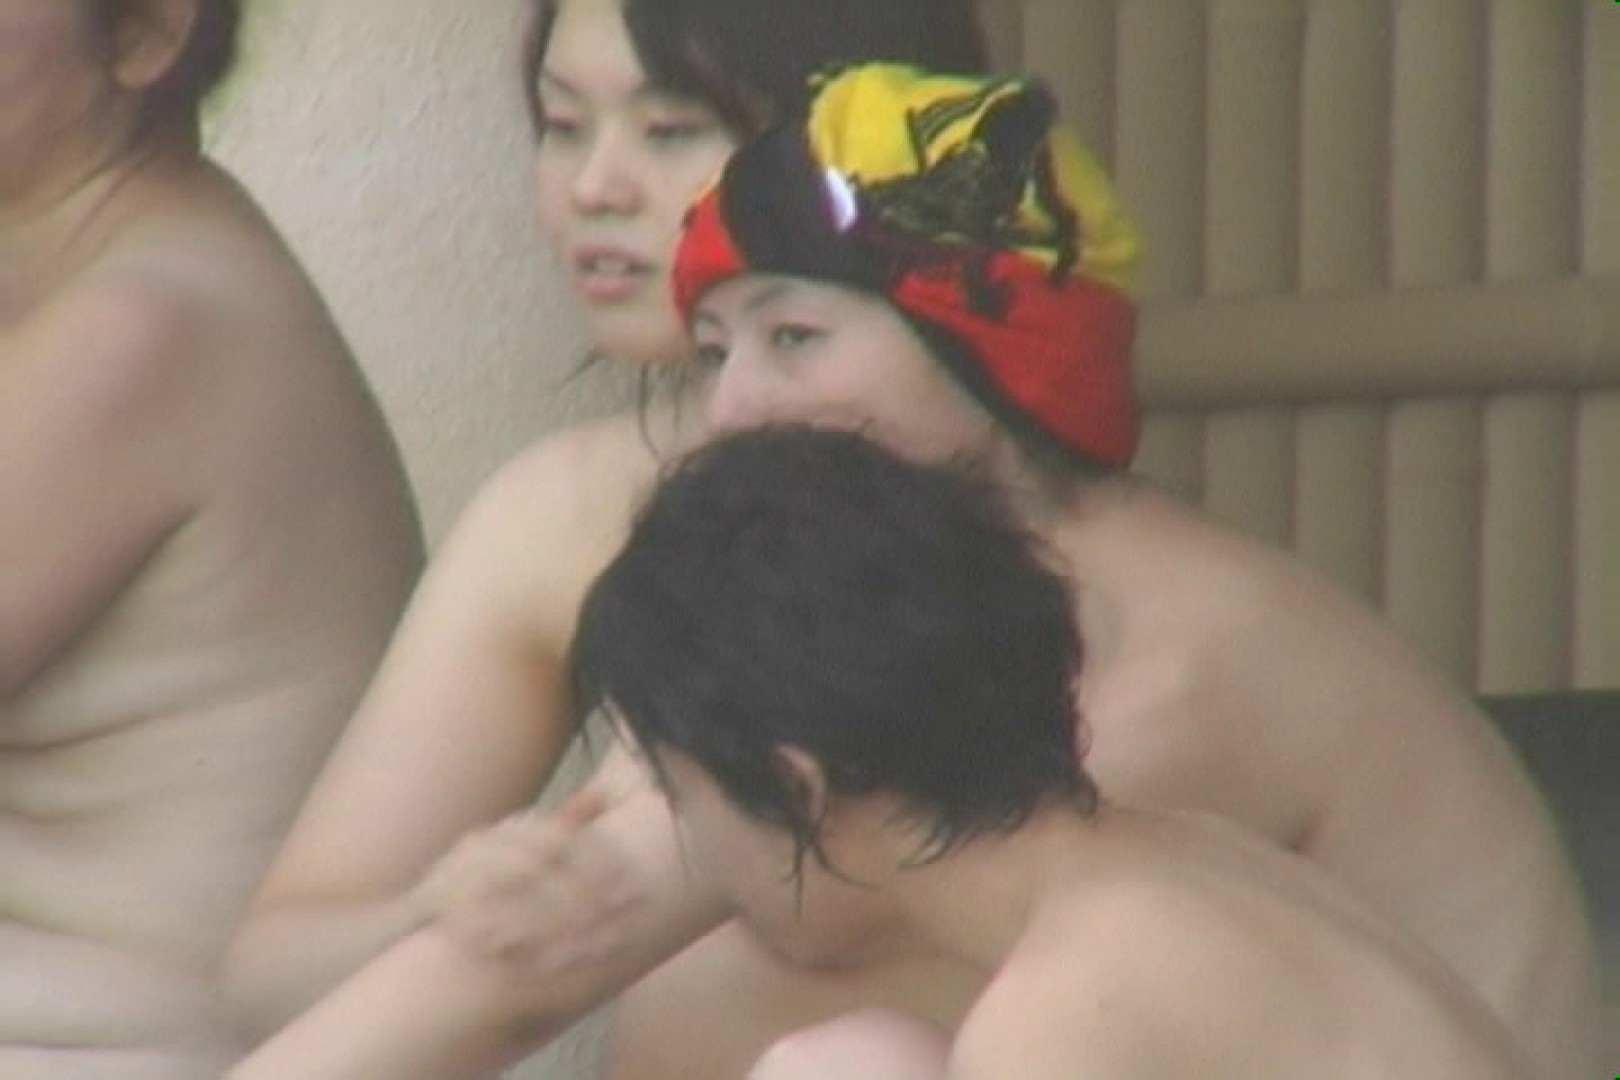 Aquaな露天風呂Vol.61【VIP限定】 露天 エロ無料画像 89連発 27